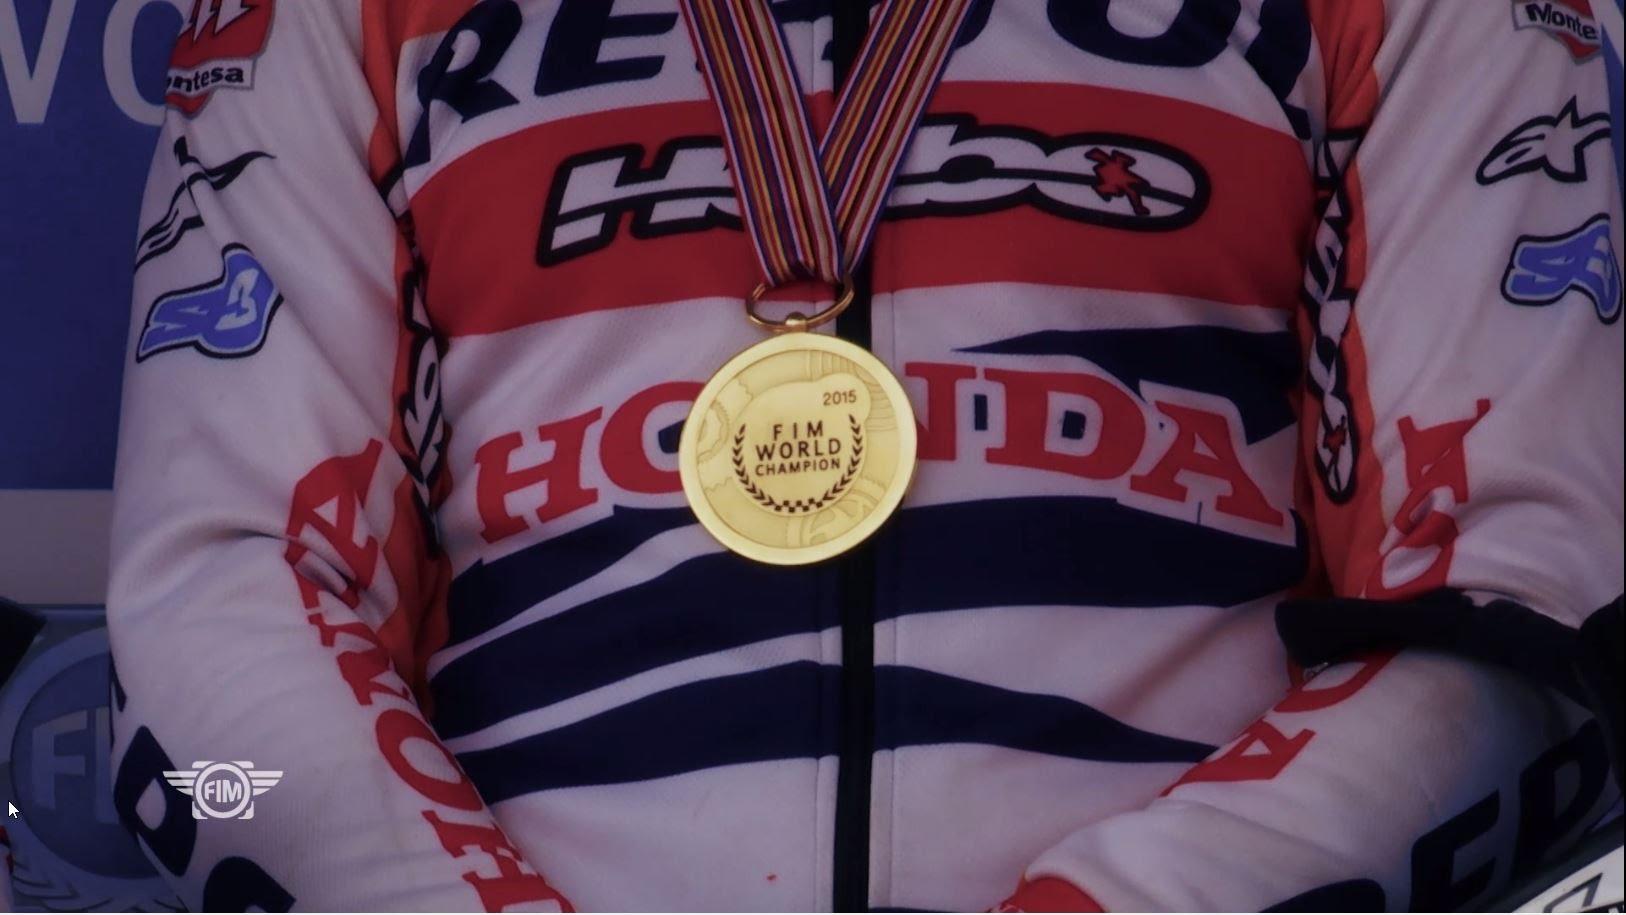 [VIDEO] 2015 FIM Trial World Championship - Season Review